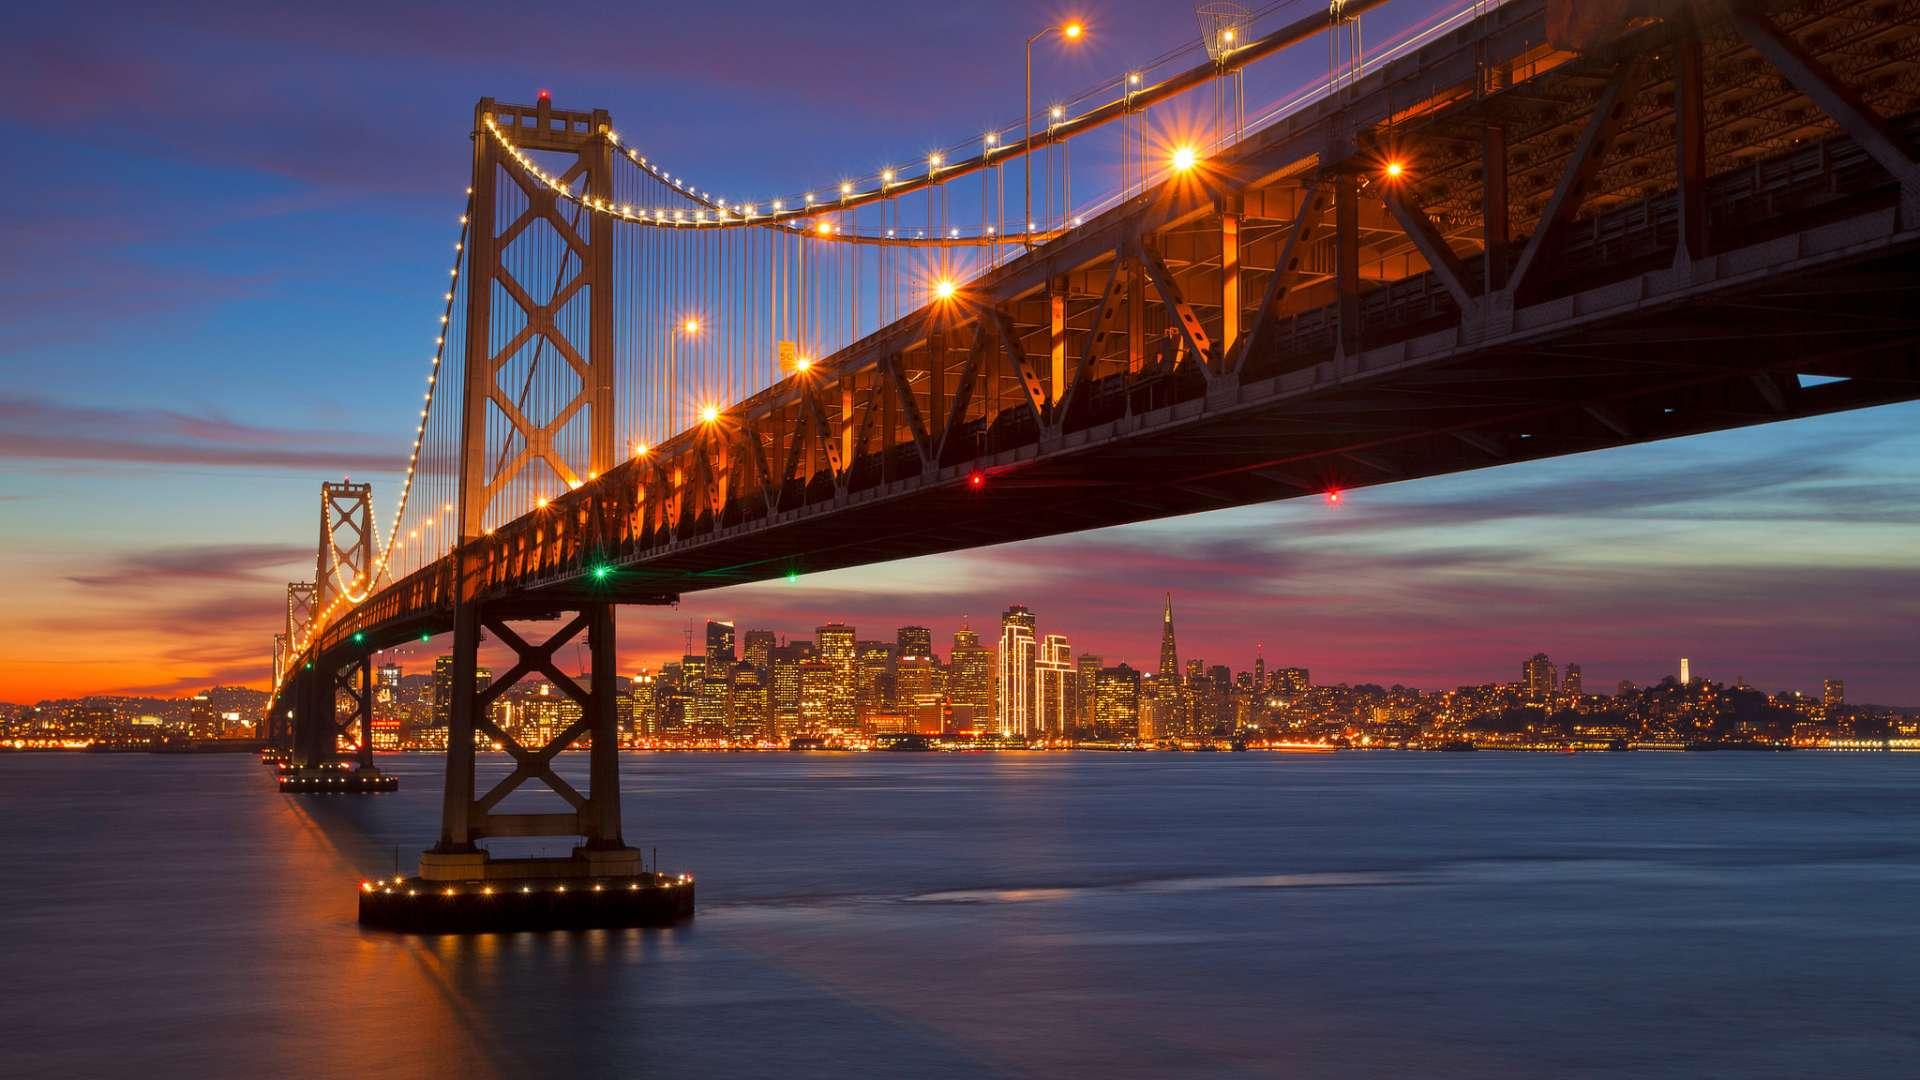 Evening Crossing, Bay Bridge, San Francisco, California скачать